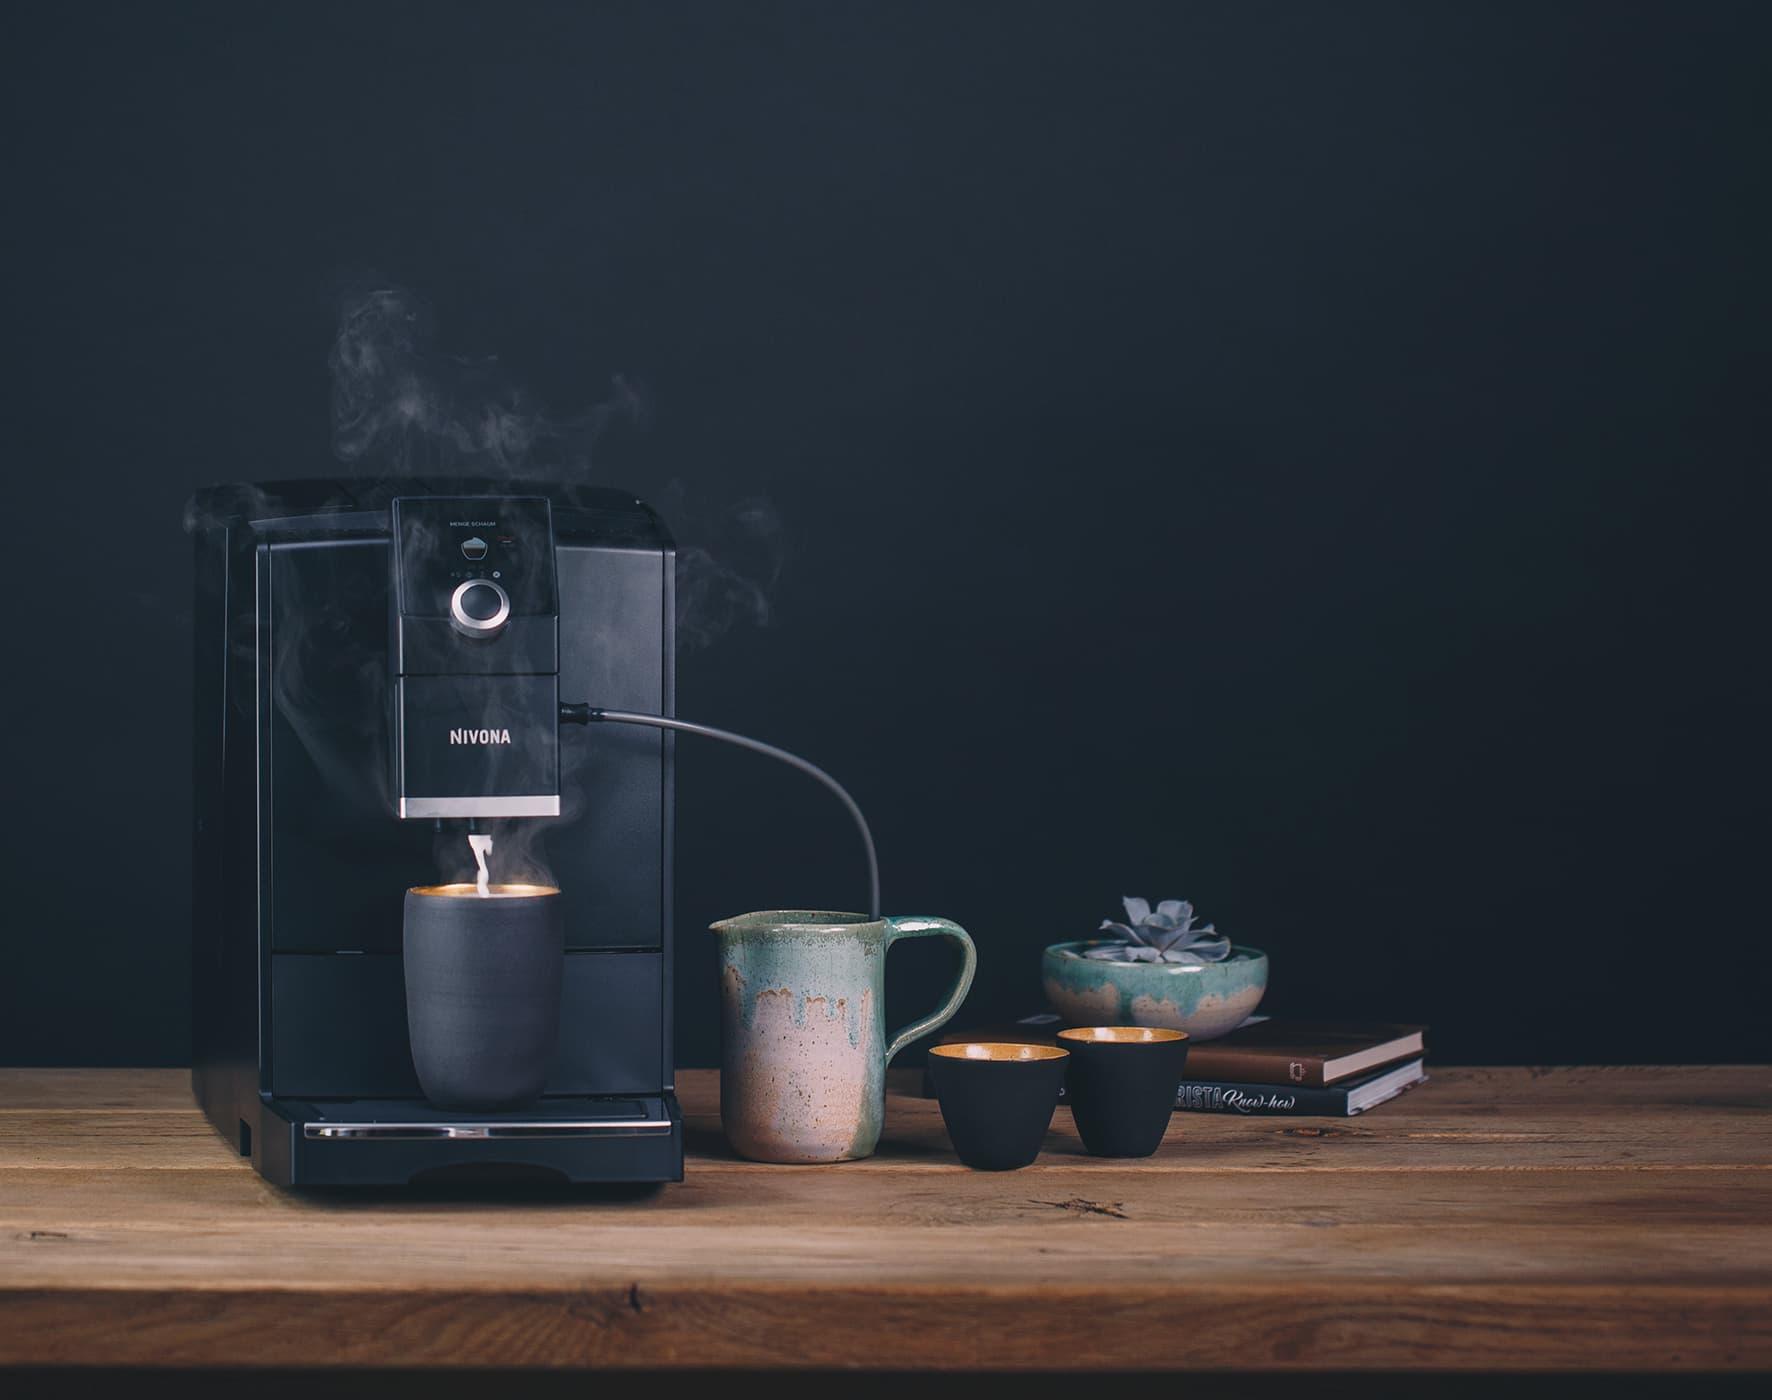 CafeRomatica NICR 790 NIVONA